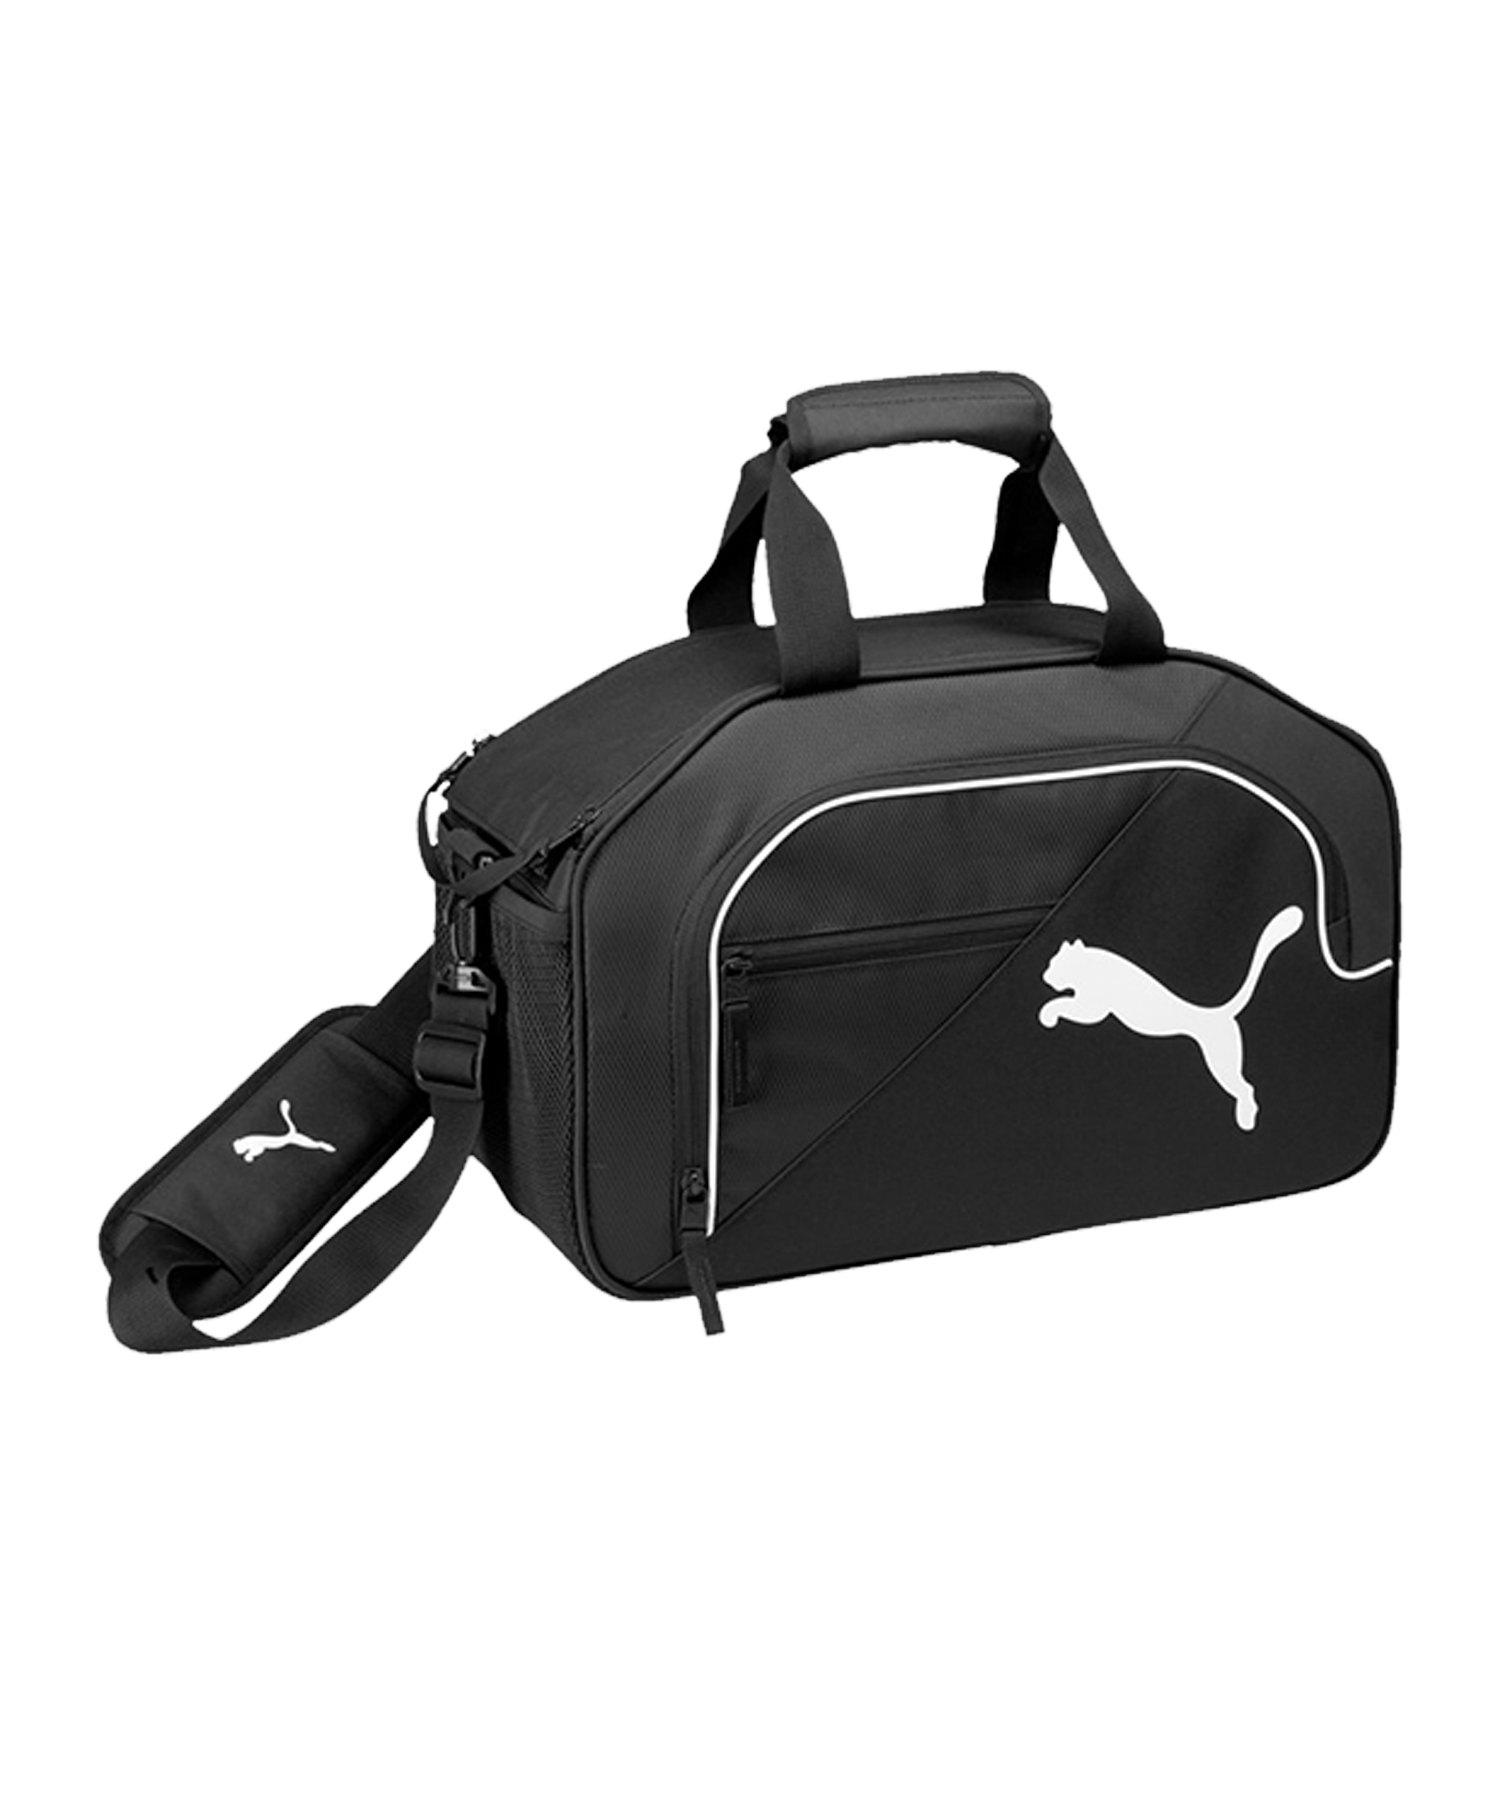 PUMA Team Medical Bag Medizintasche Schwarz F01 - schwarz